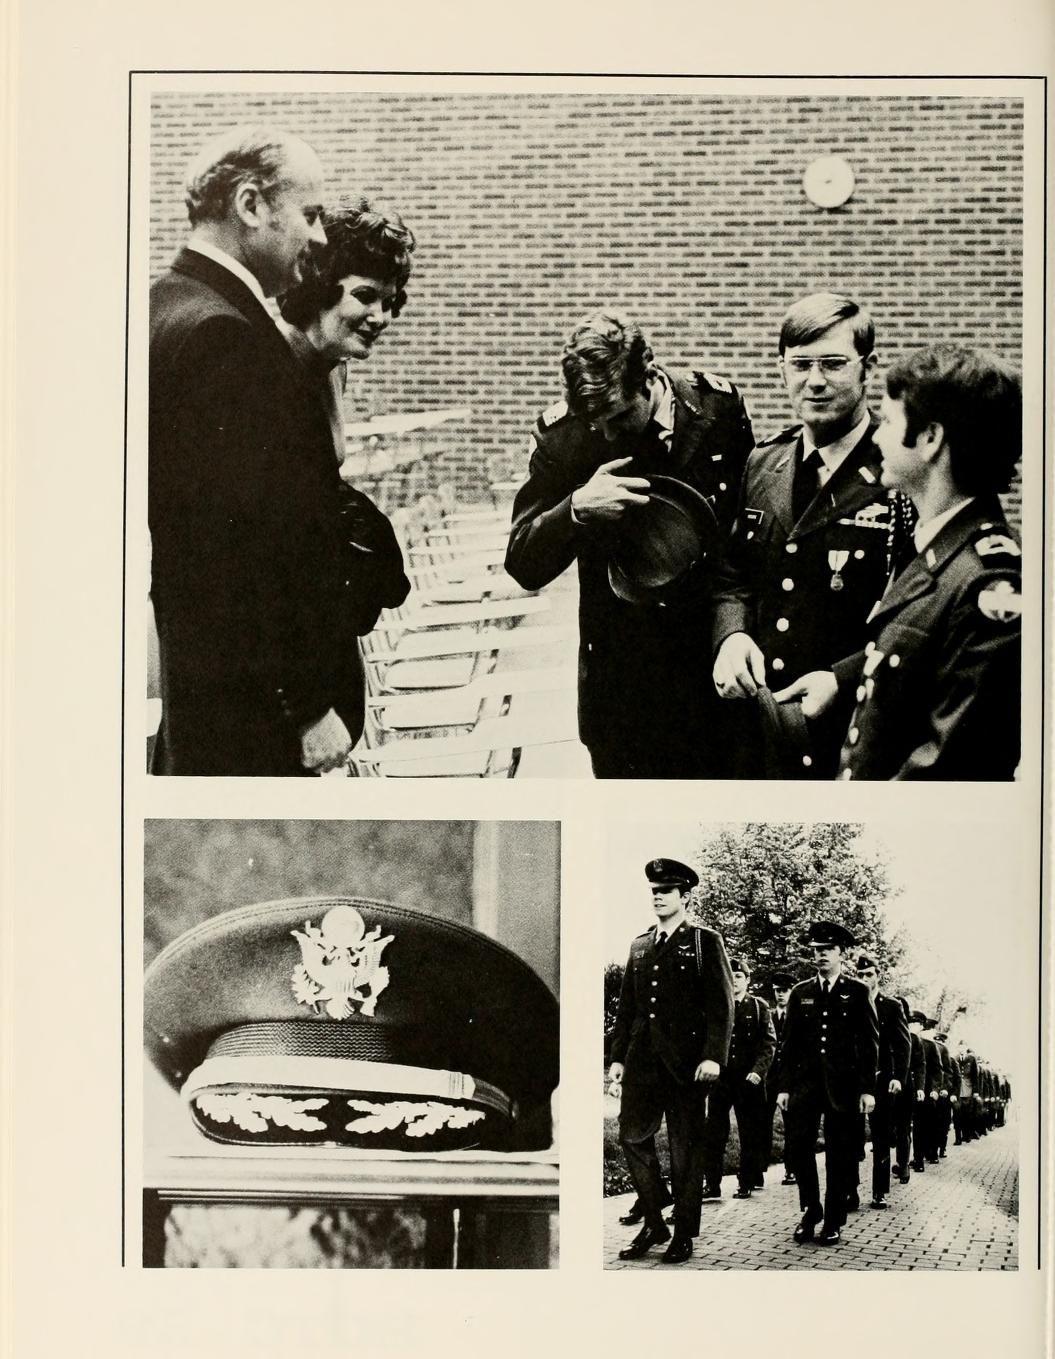 athena yearbook 1973 rotc at ohio u pinterest military photos